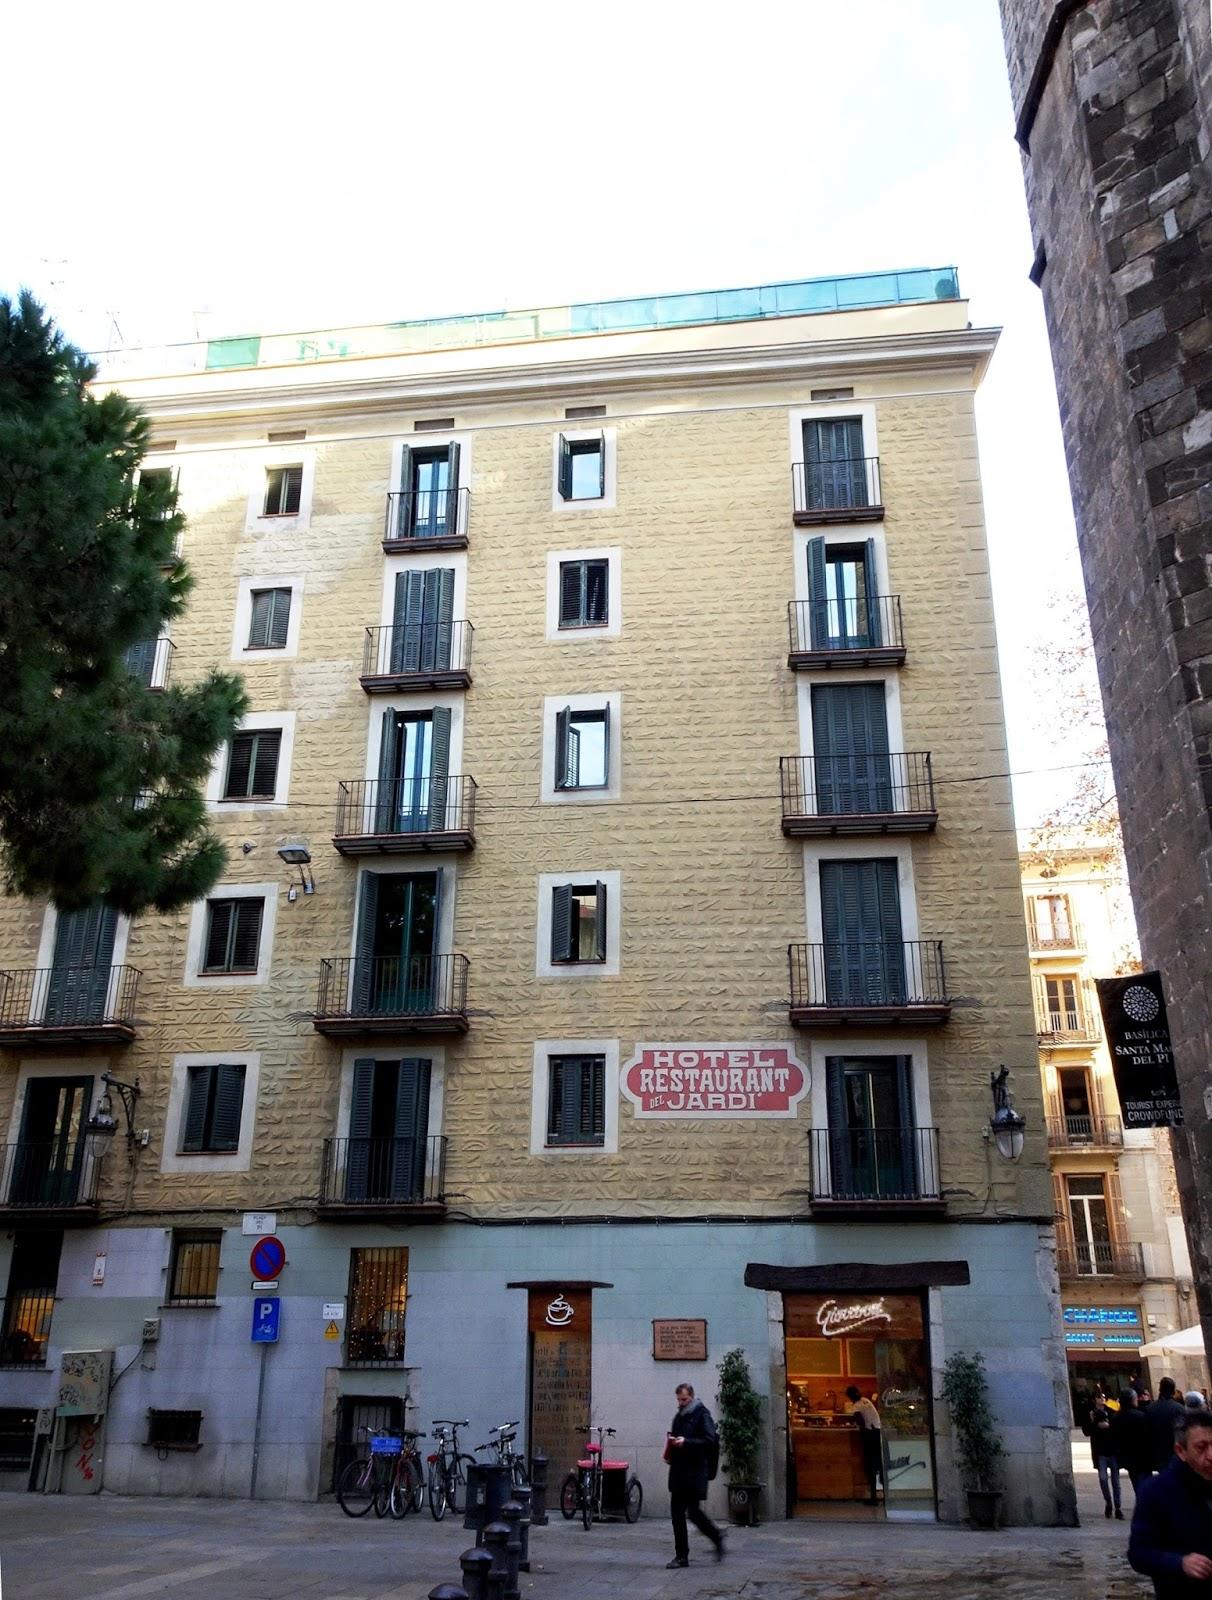 Redescubriendo barcelona y m s all 11 01 2017 hotel del for Hotel jardi barcelona